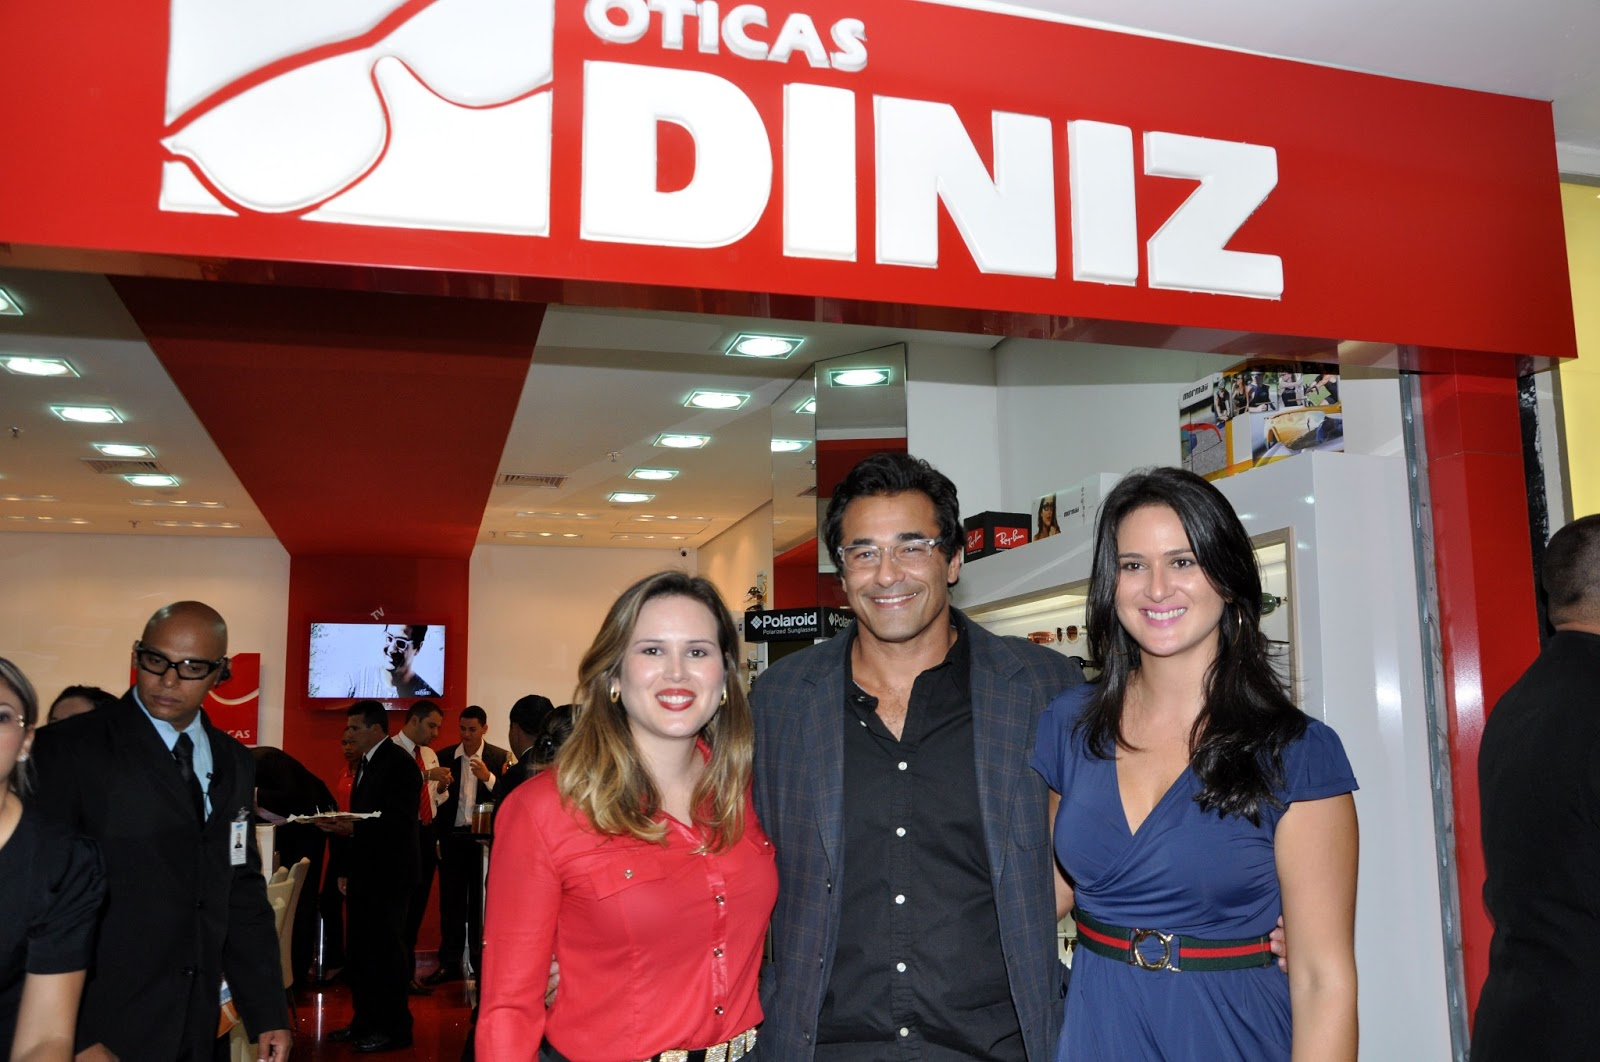 F shion Tour Brasil  Ótica Diniz inaugurou loja no shopping Pátio Brasil df5f2546ee